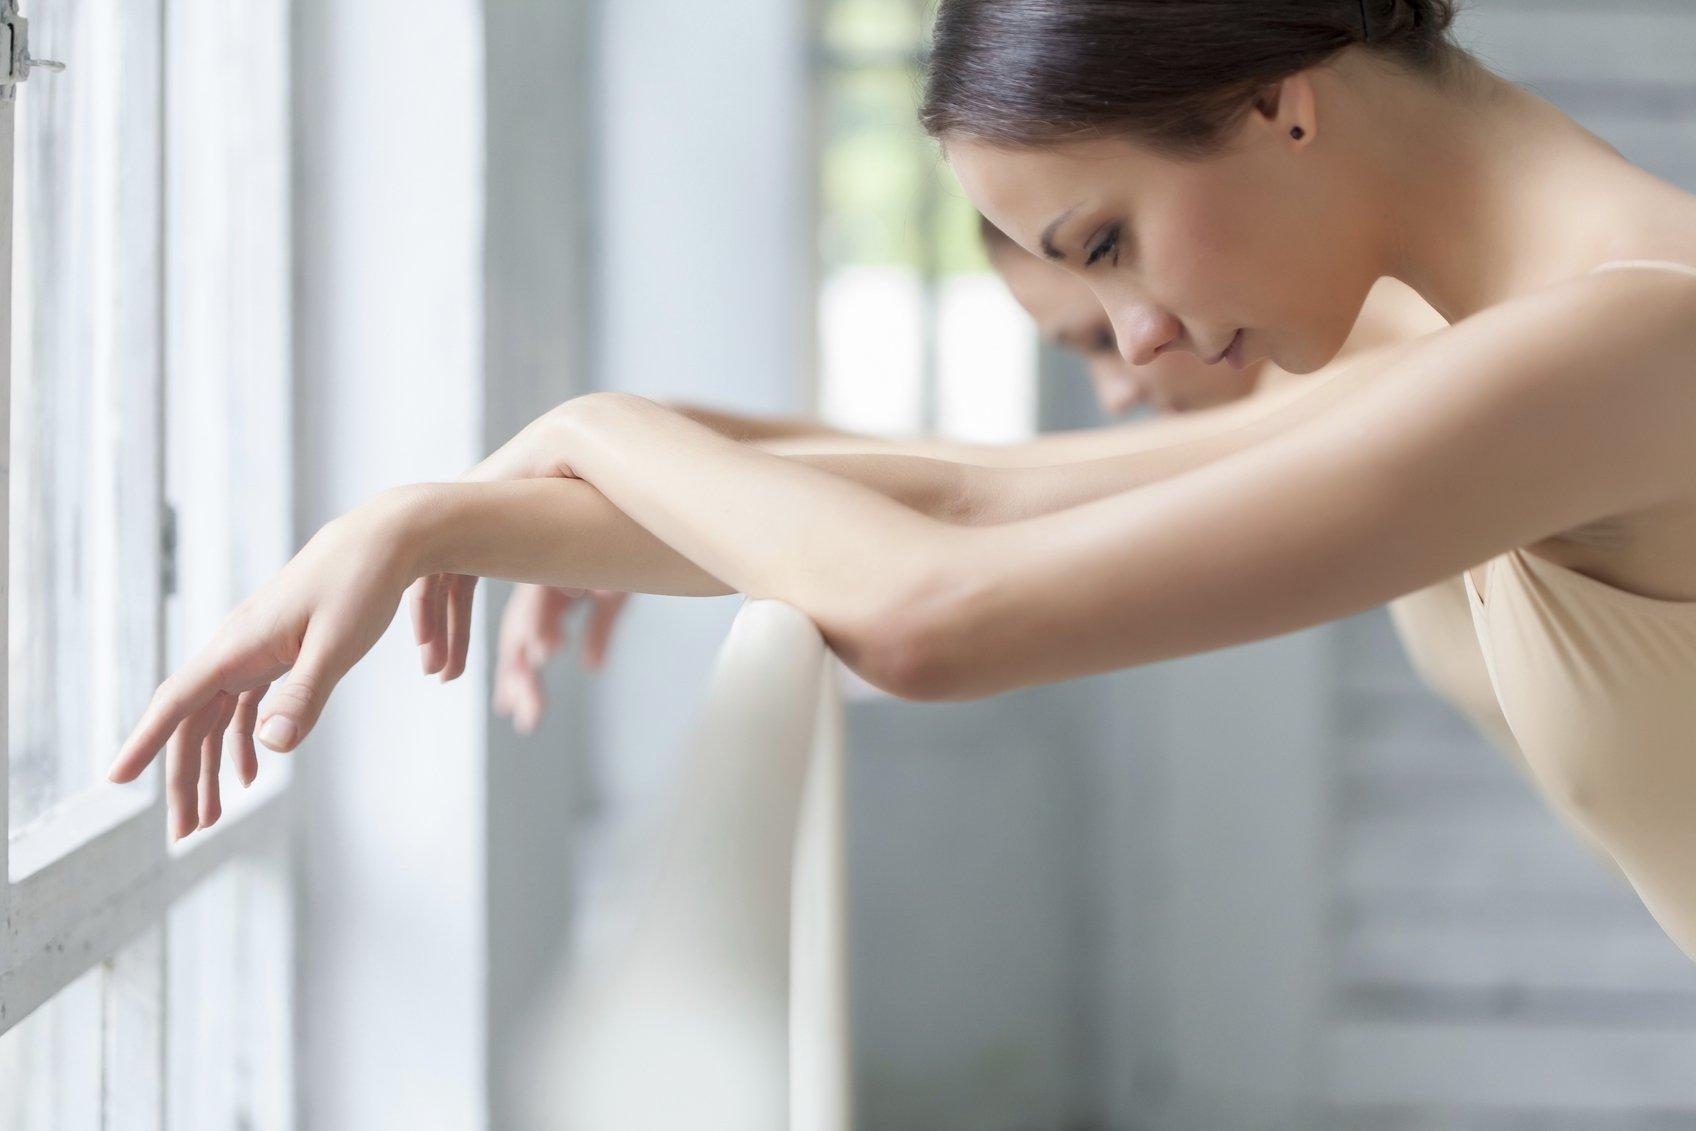 ballerina-arms-look-phenomenal-sleeveless-shirts